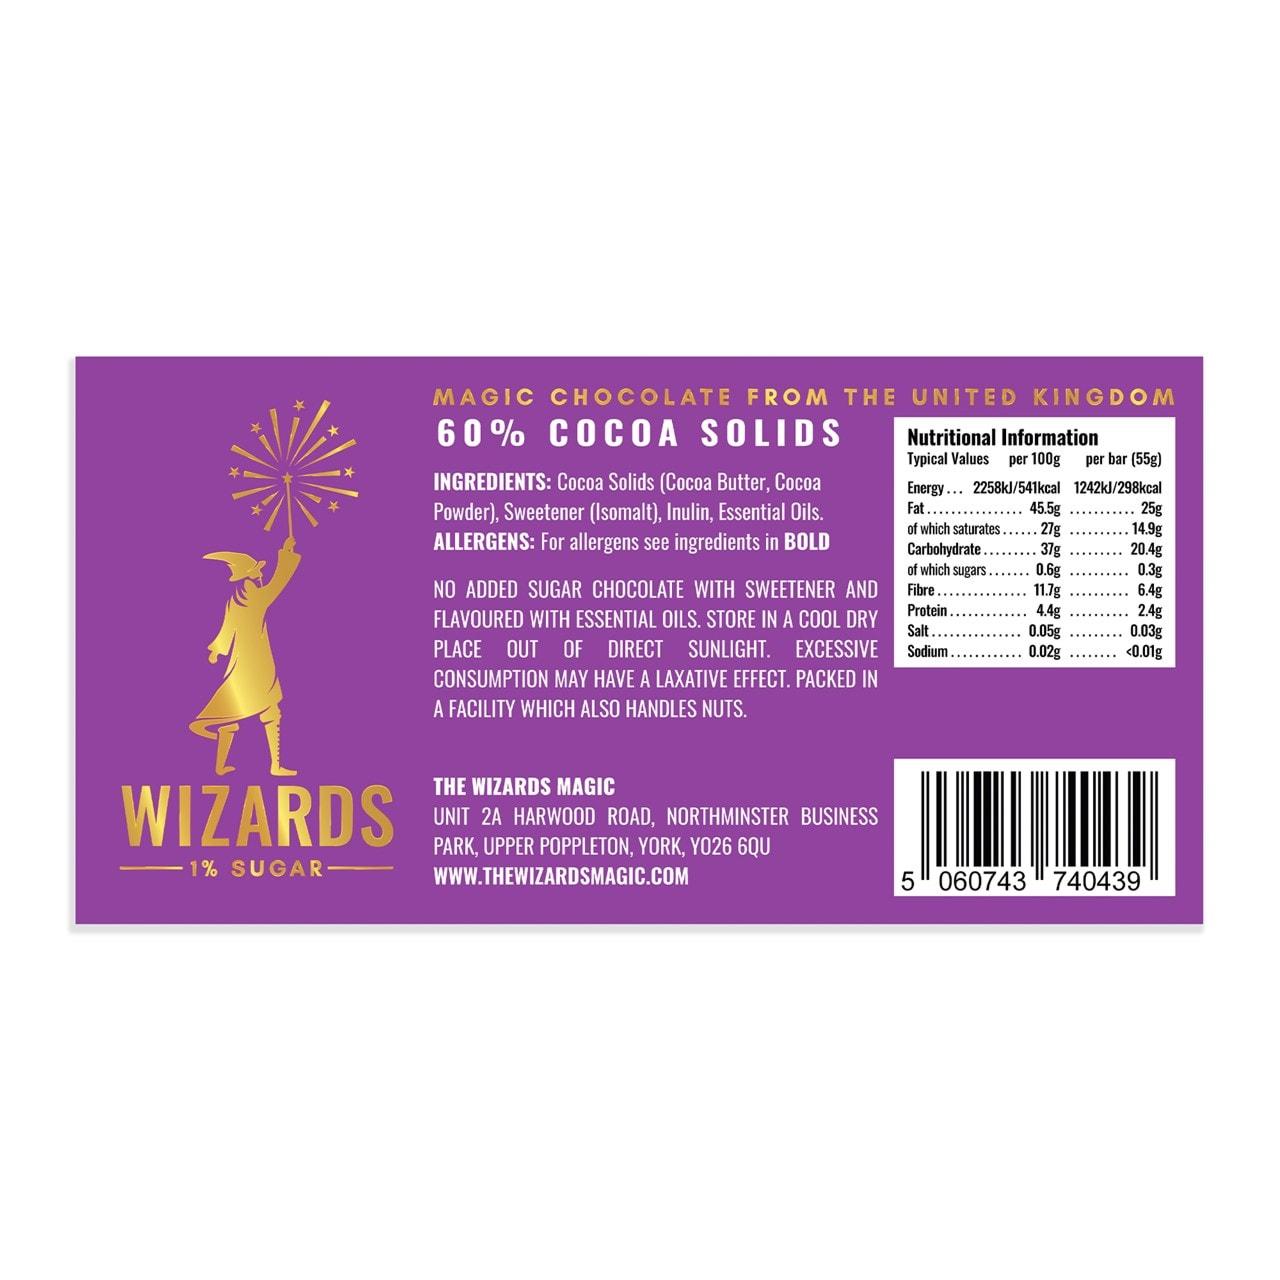 Wizards Magic Chocolate: 1% Sugar Original Gift Pack: Mint & Orange (Pack of 4) - 2